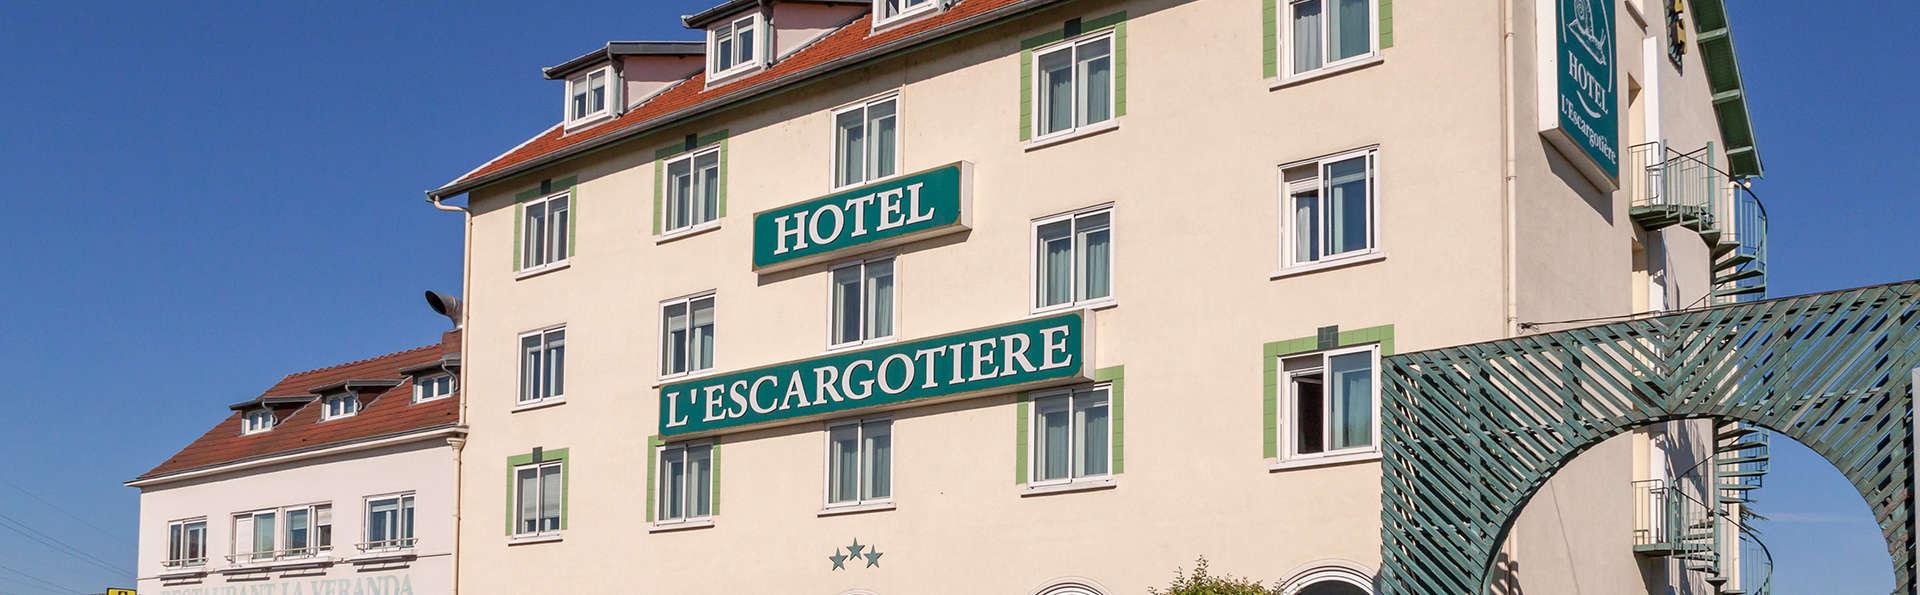 Hôtel l'Escargotière - Edit_Front.jpg